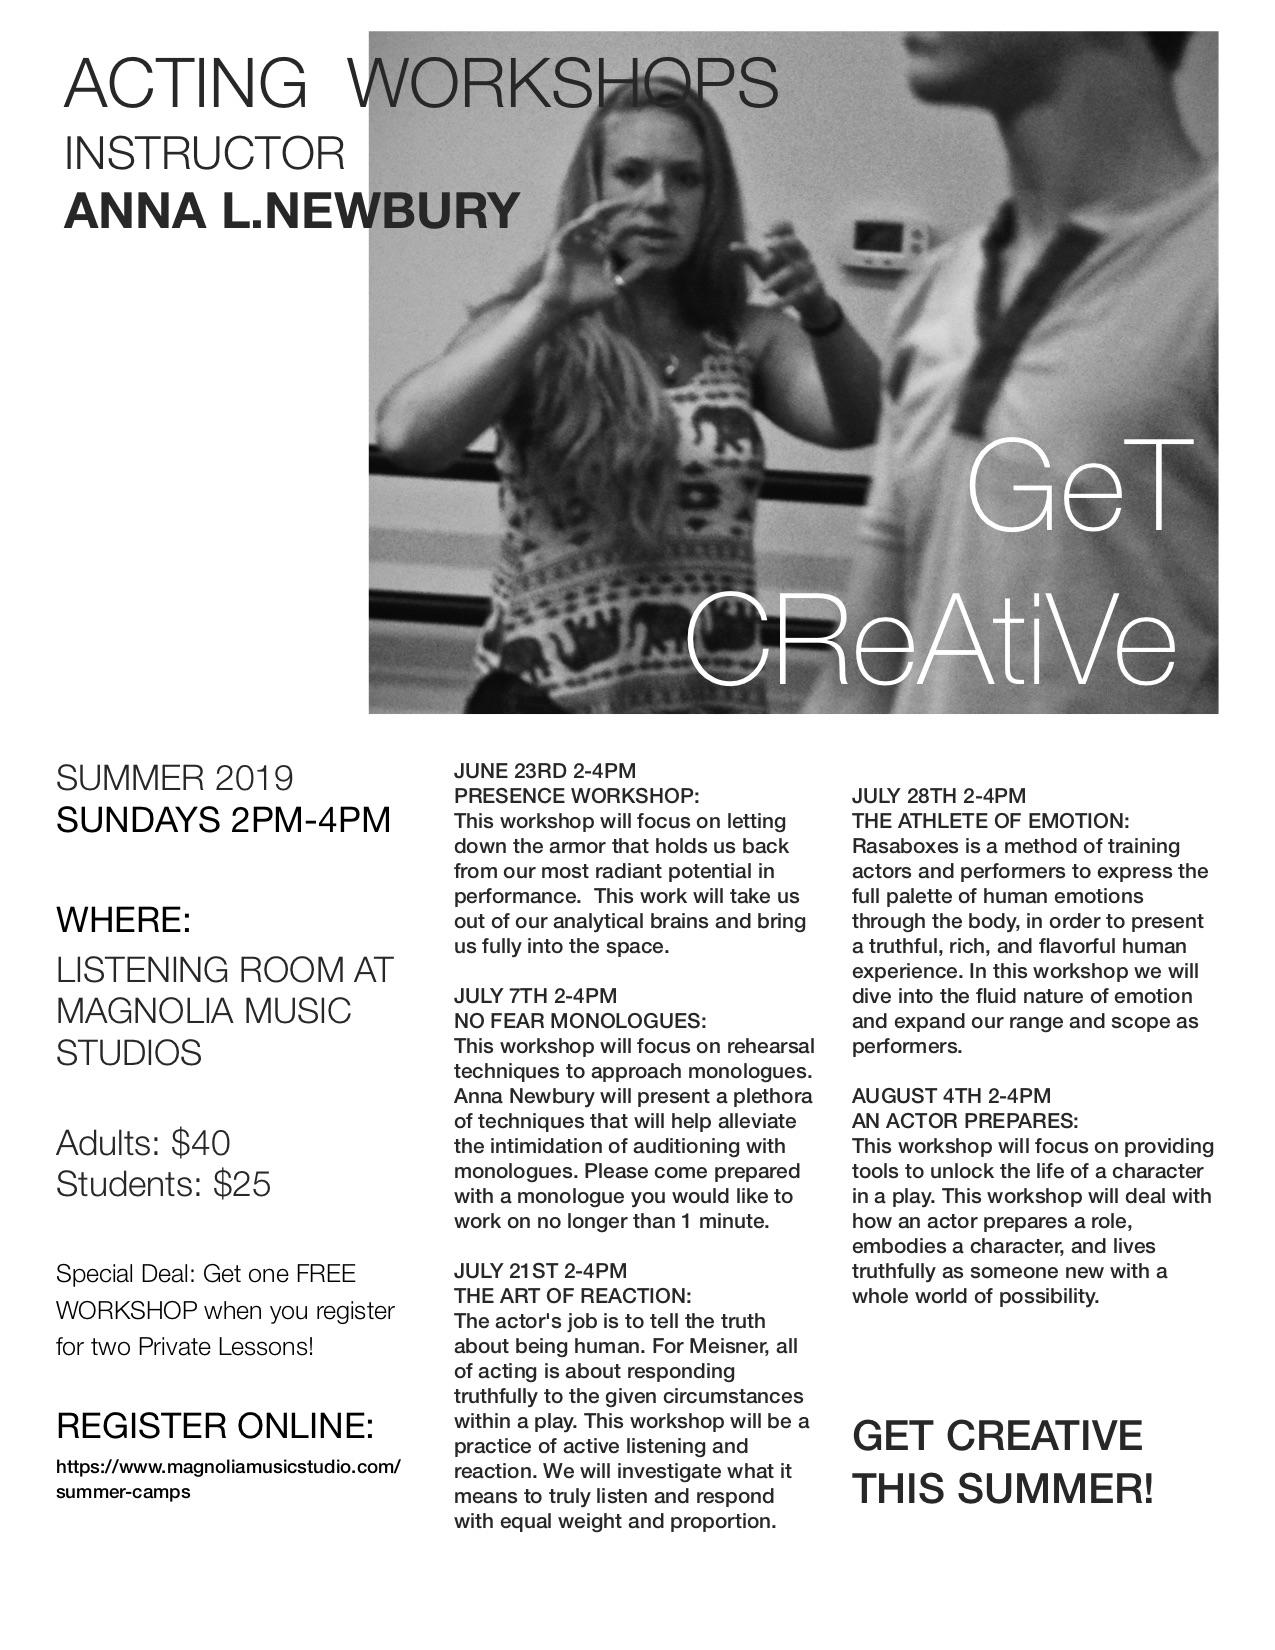 Anna Newbury Summer Workshops 2019 flyer.jpg